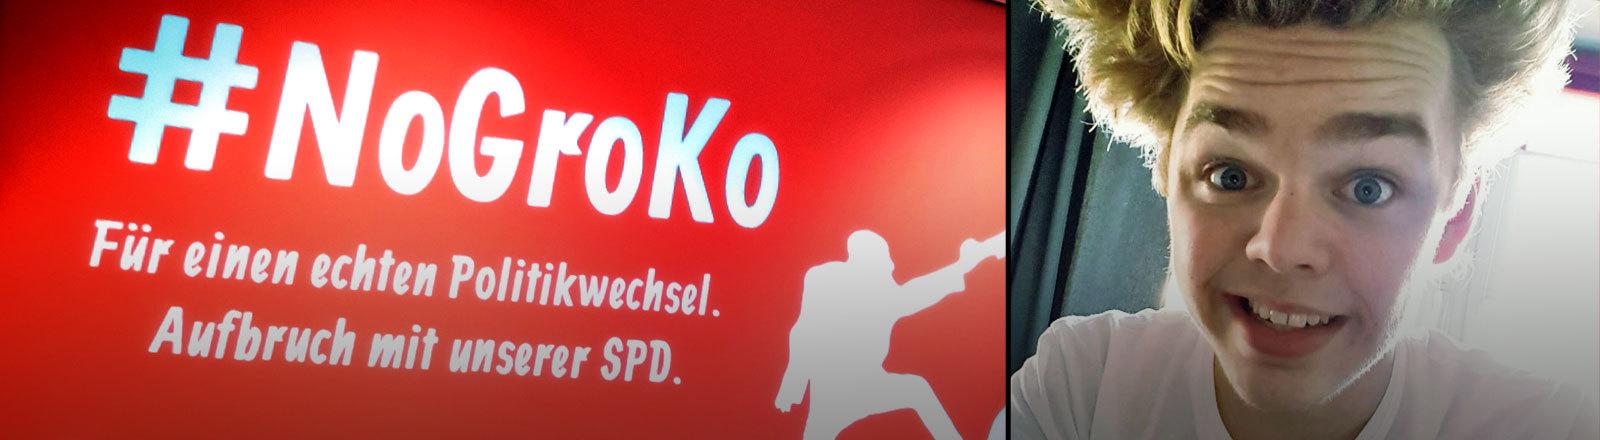 Sebastian Sieg, SPD-Mitglied